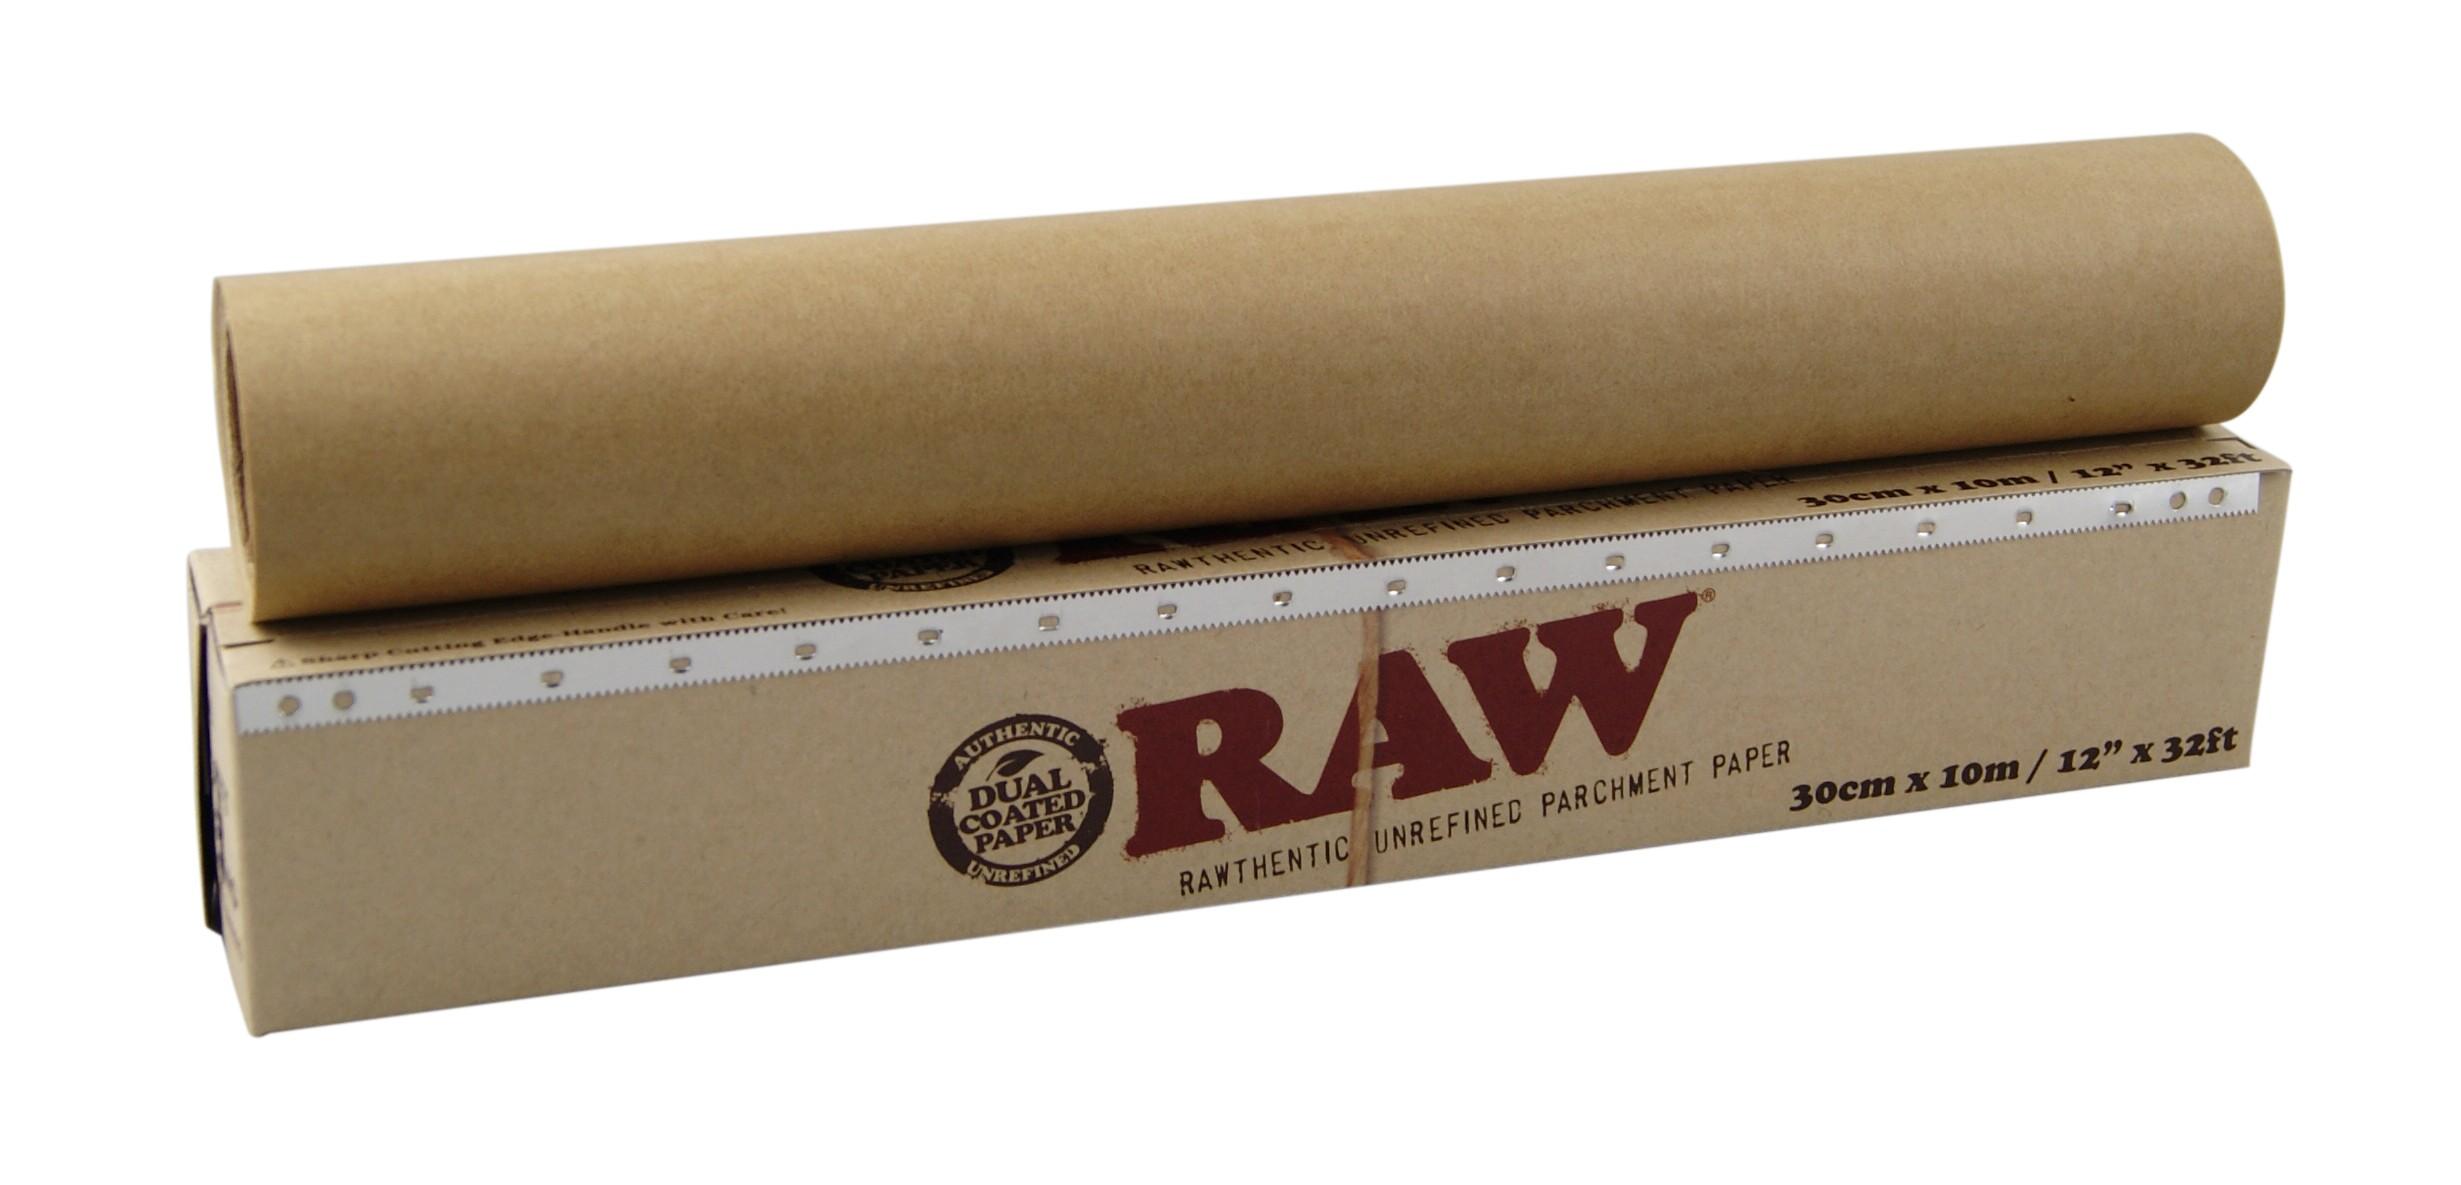 comprar parchment papel raw bho